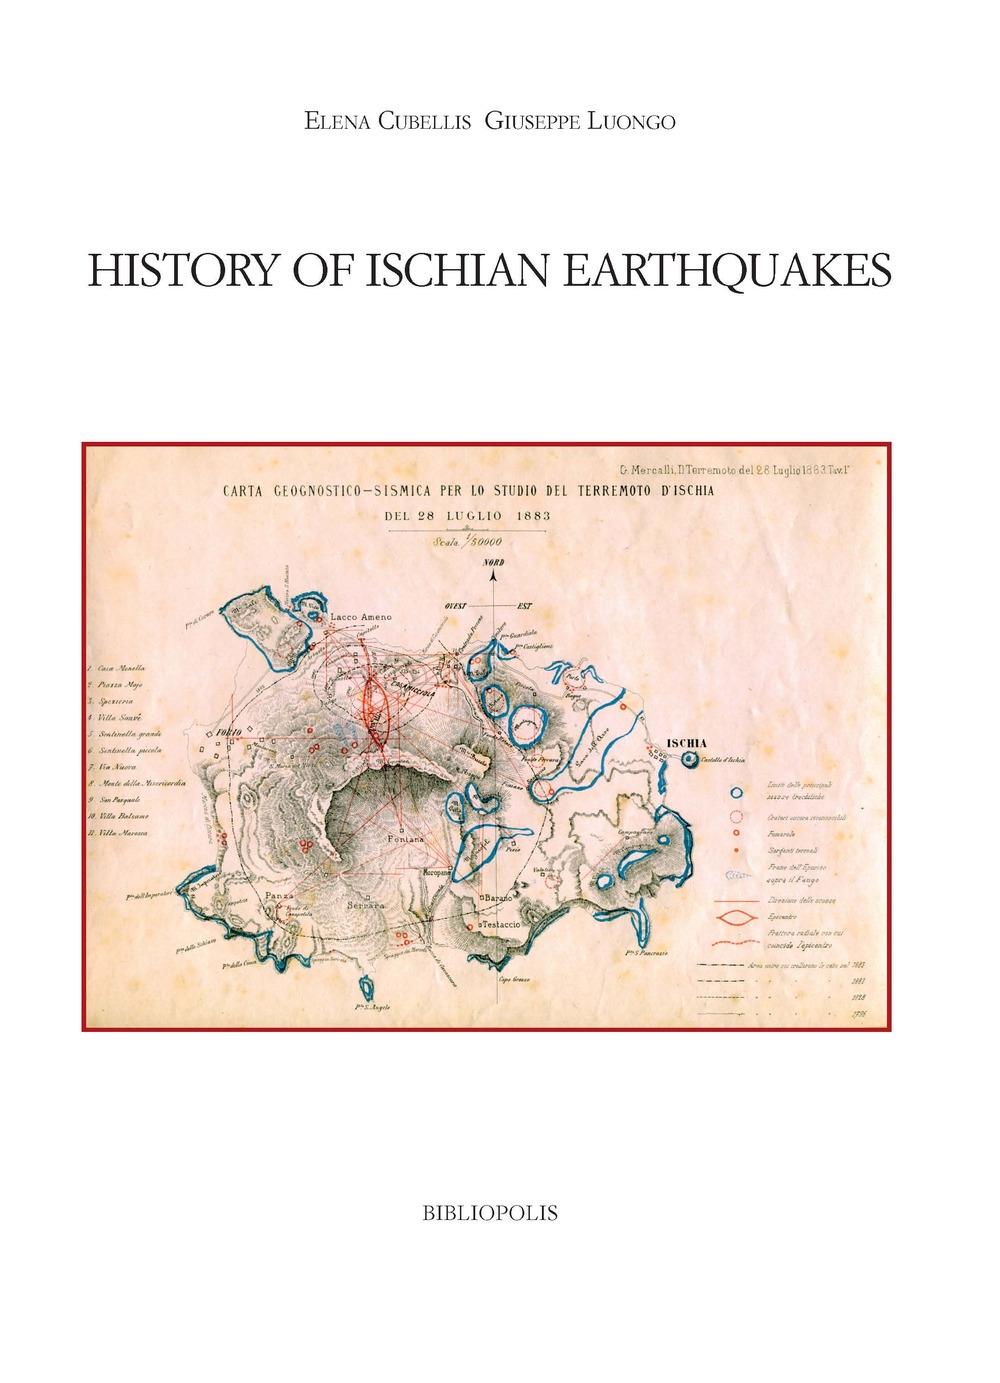 History of Ischian earthquakes